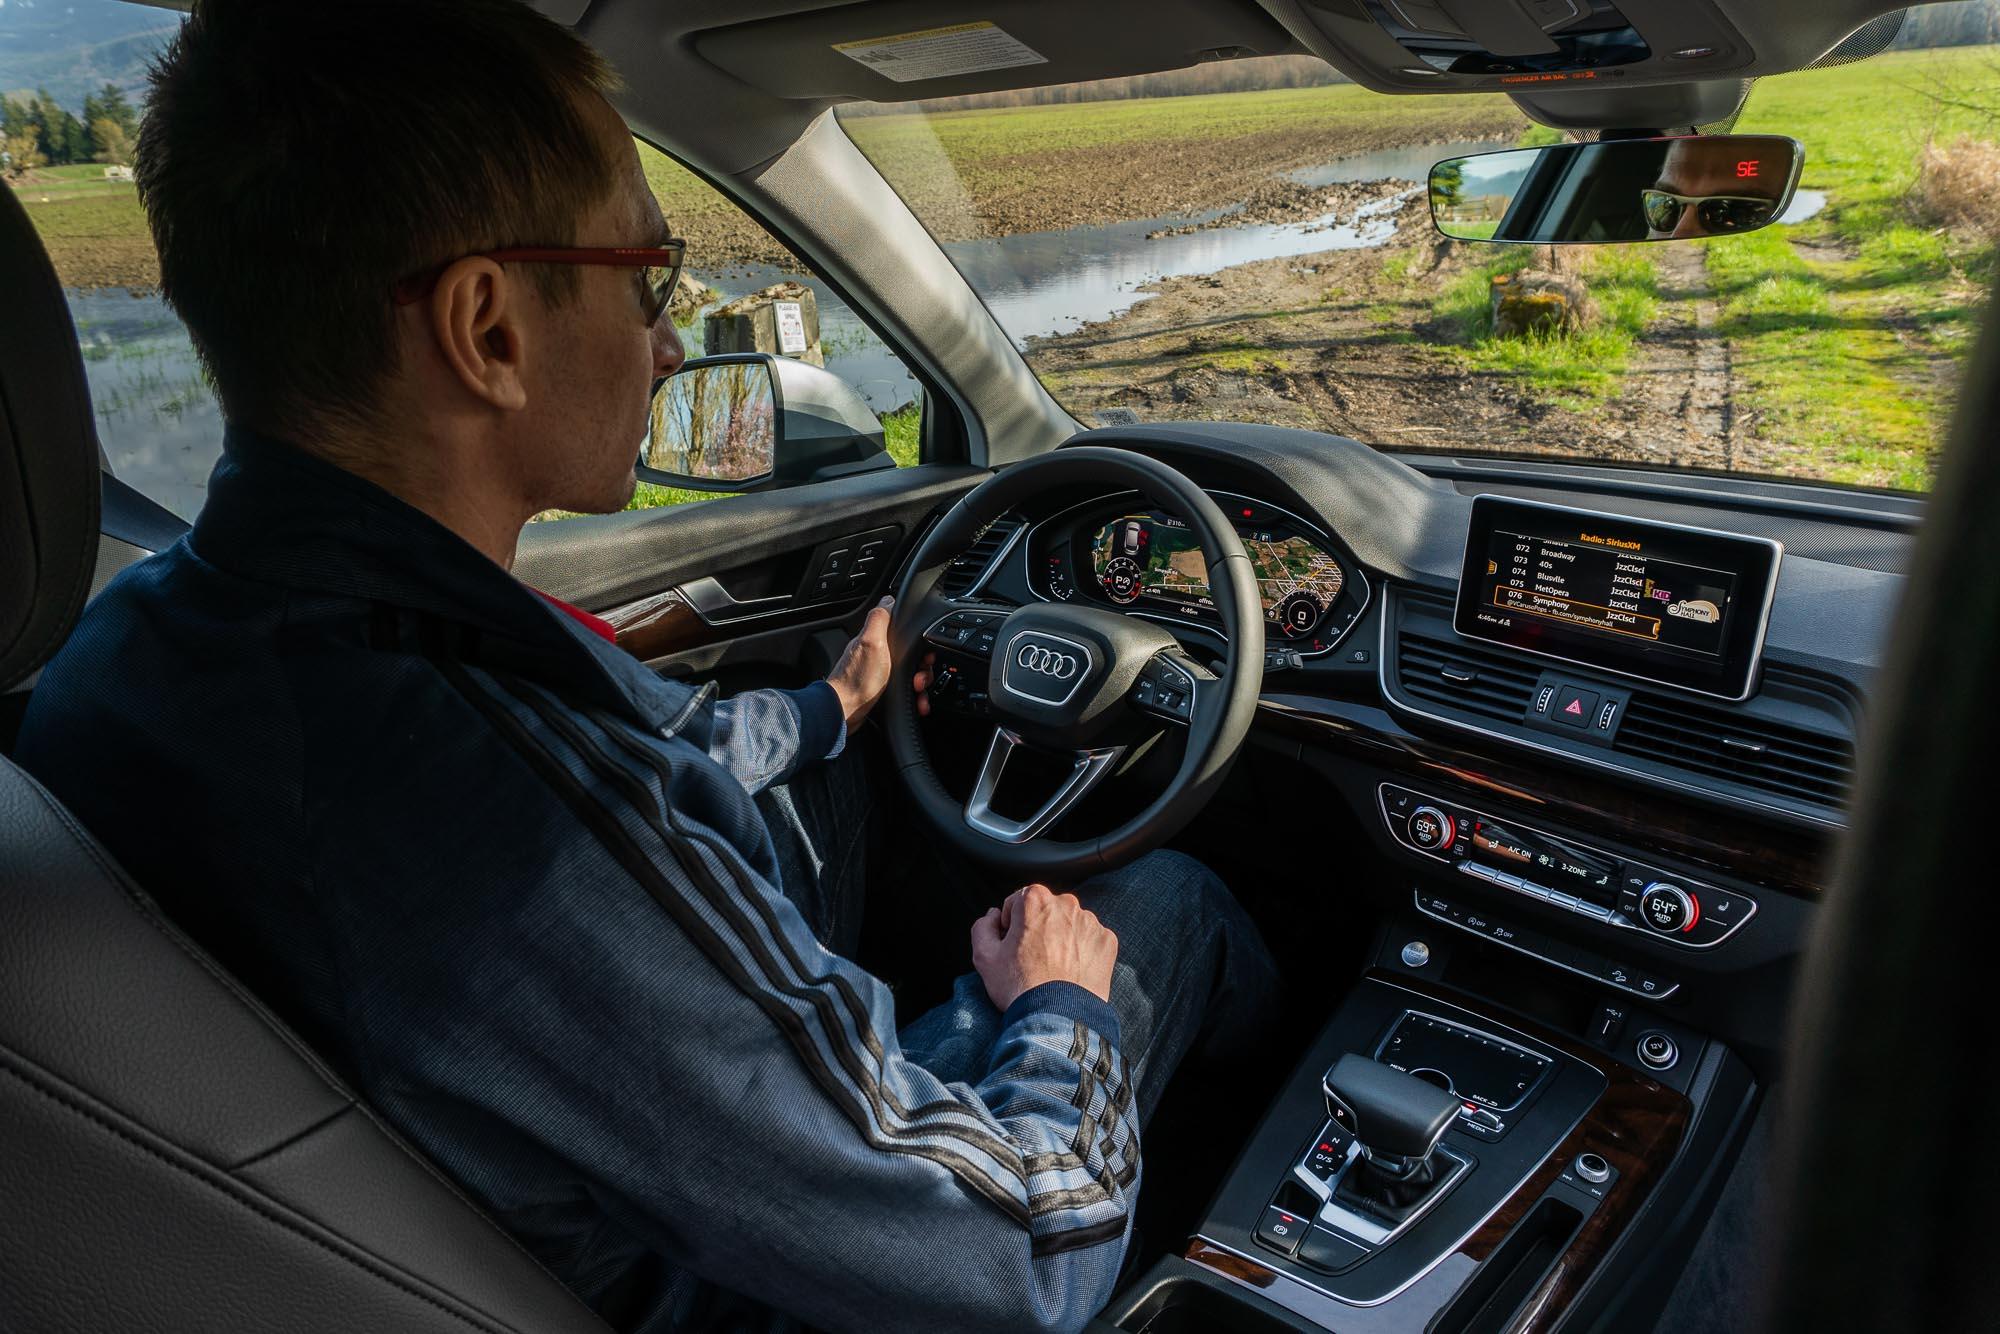 Pratt_Silvercar Audi_013.jpg